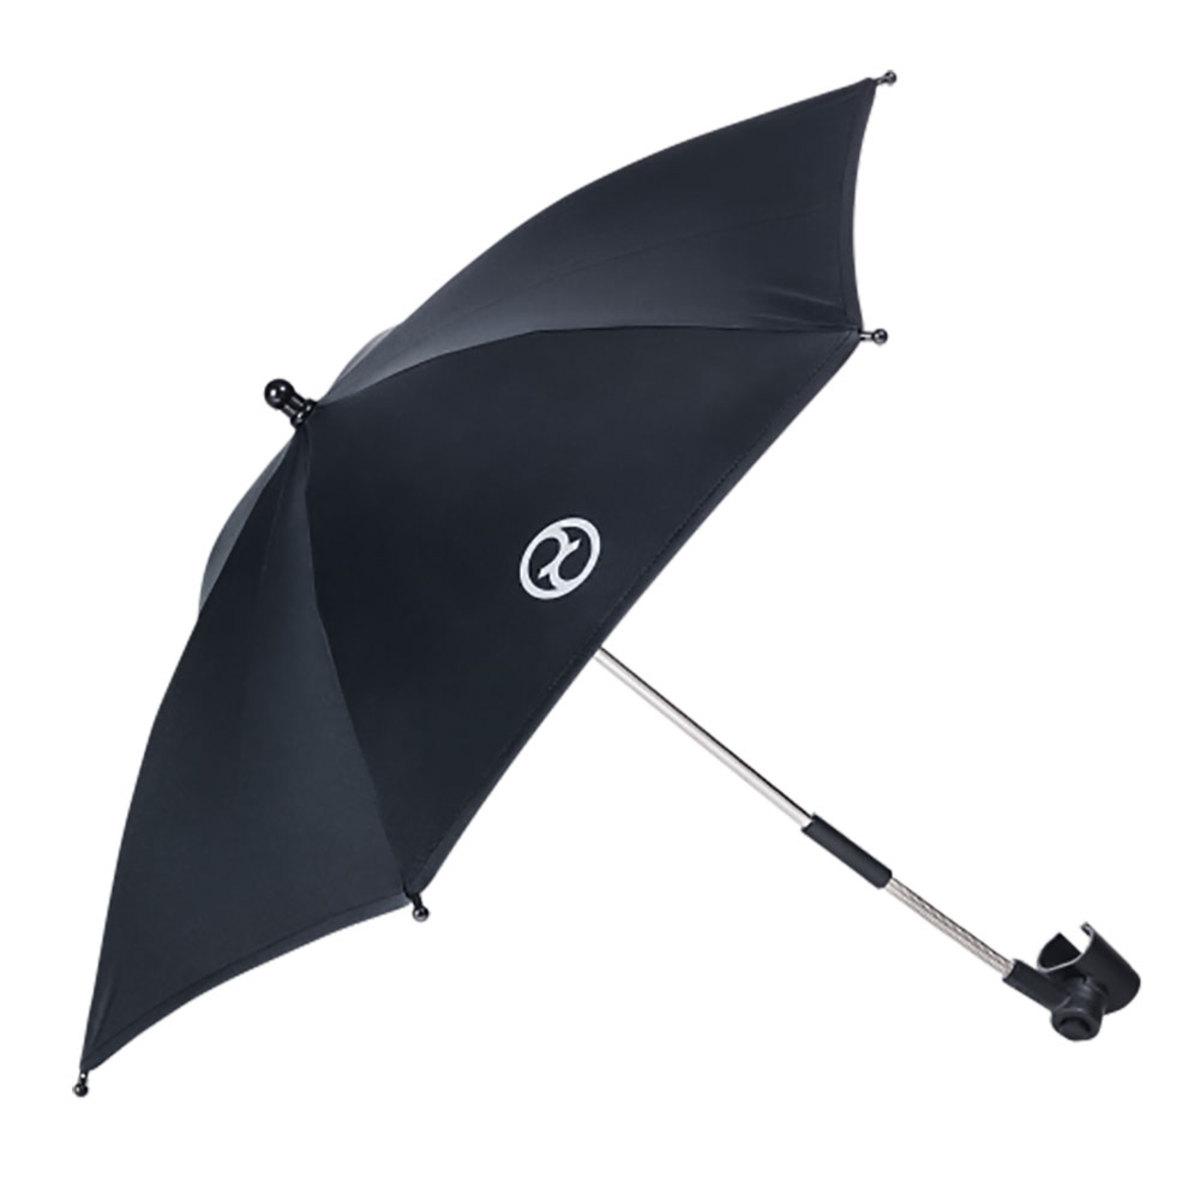 Ombrelle et protection Ombrelle - Black Ombrelle - Black